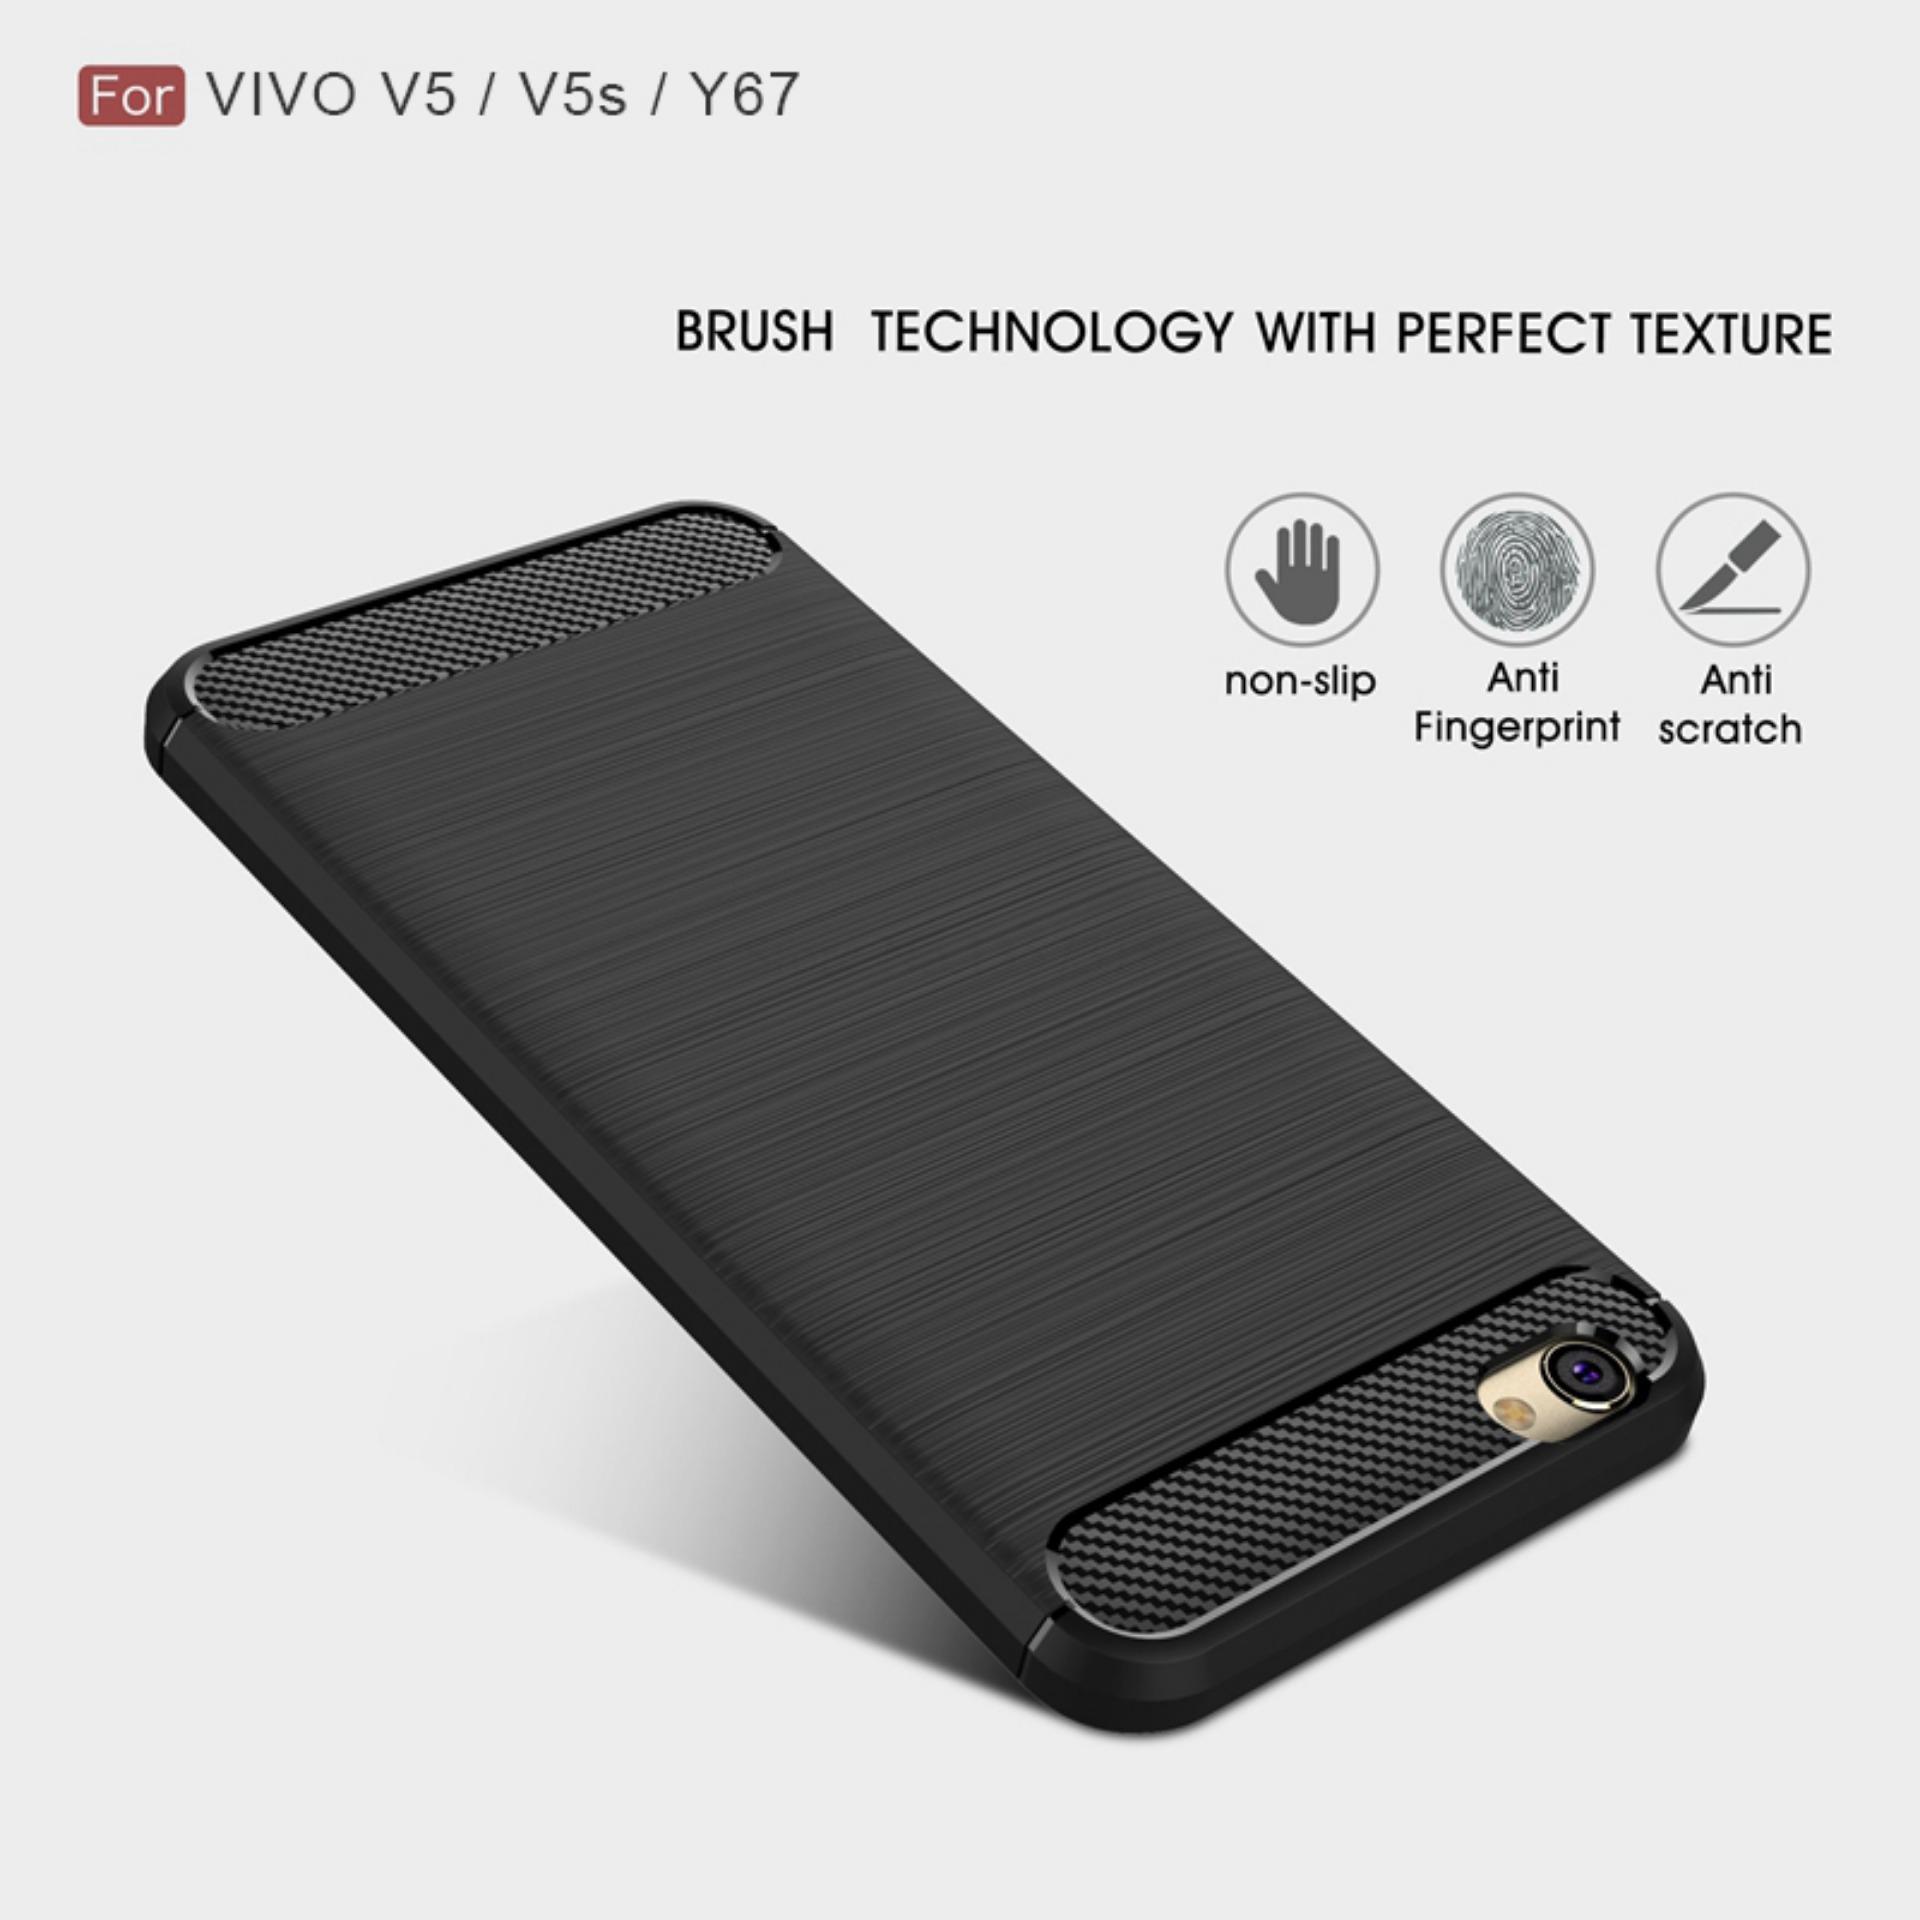 Harga Terbaru Intristore Fashion Printing Phone Case Vivo V5/V5S/V5LITE - 112.